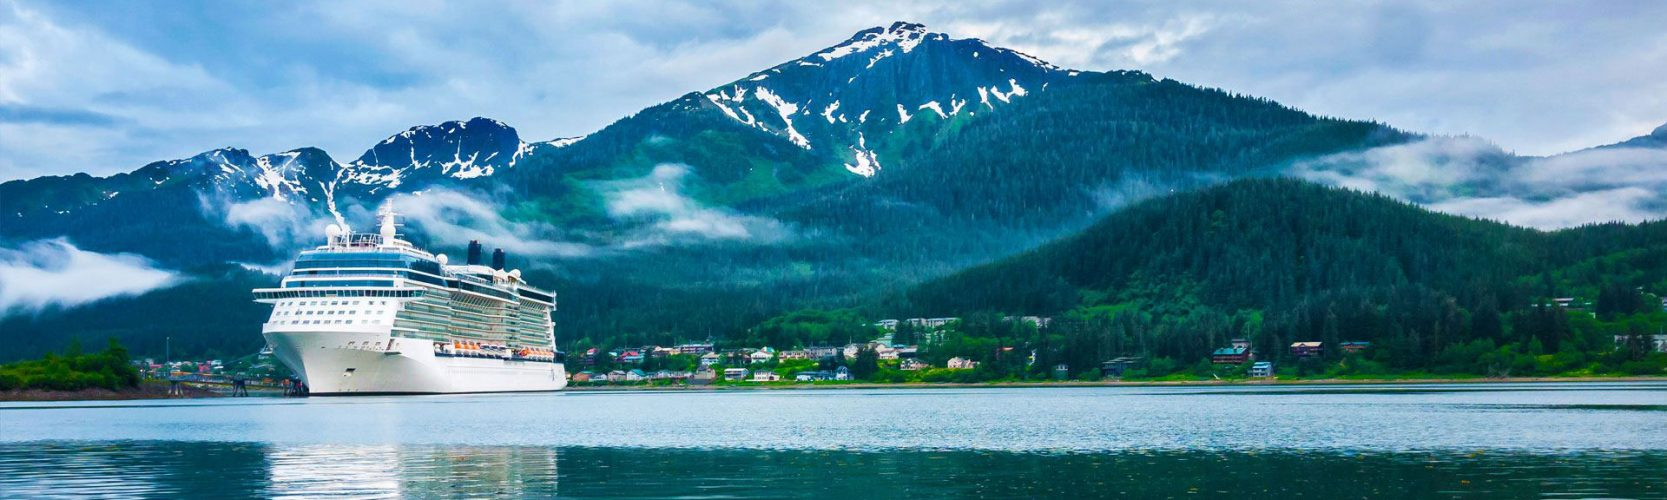 The Truss - Alaskan Cruise 2016